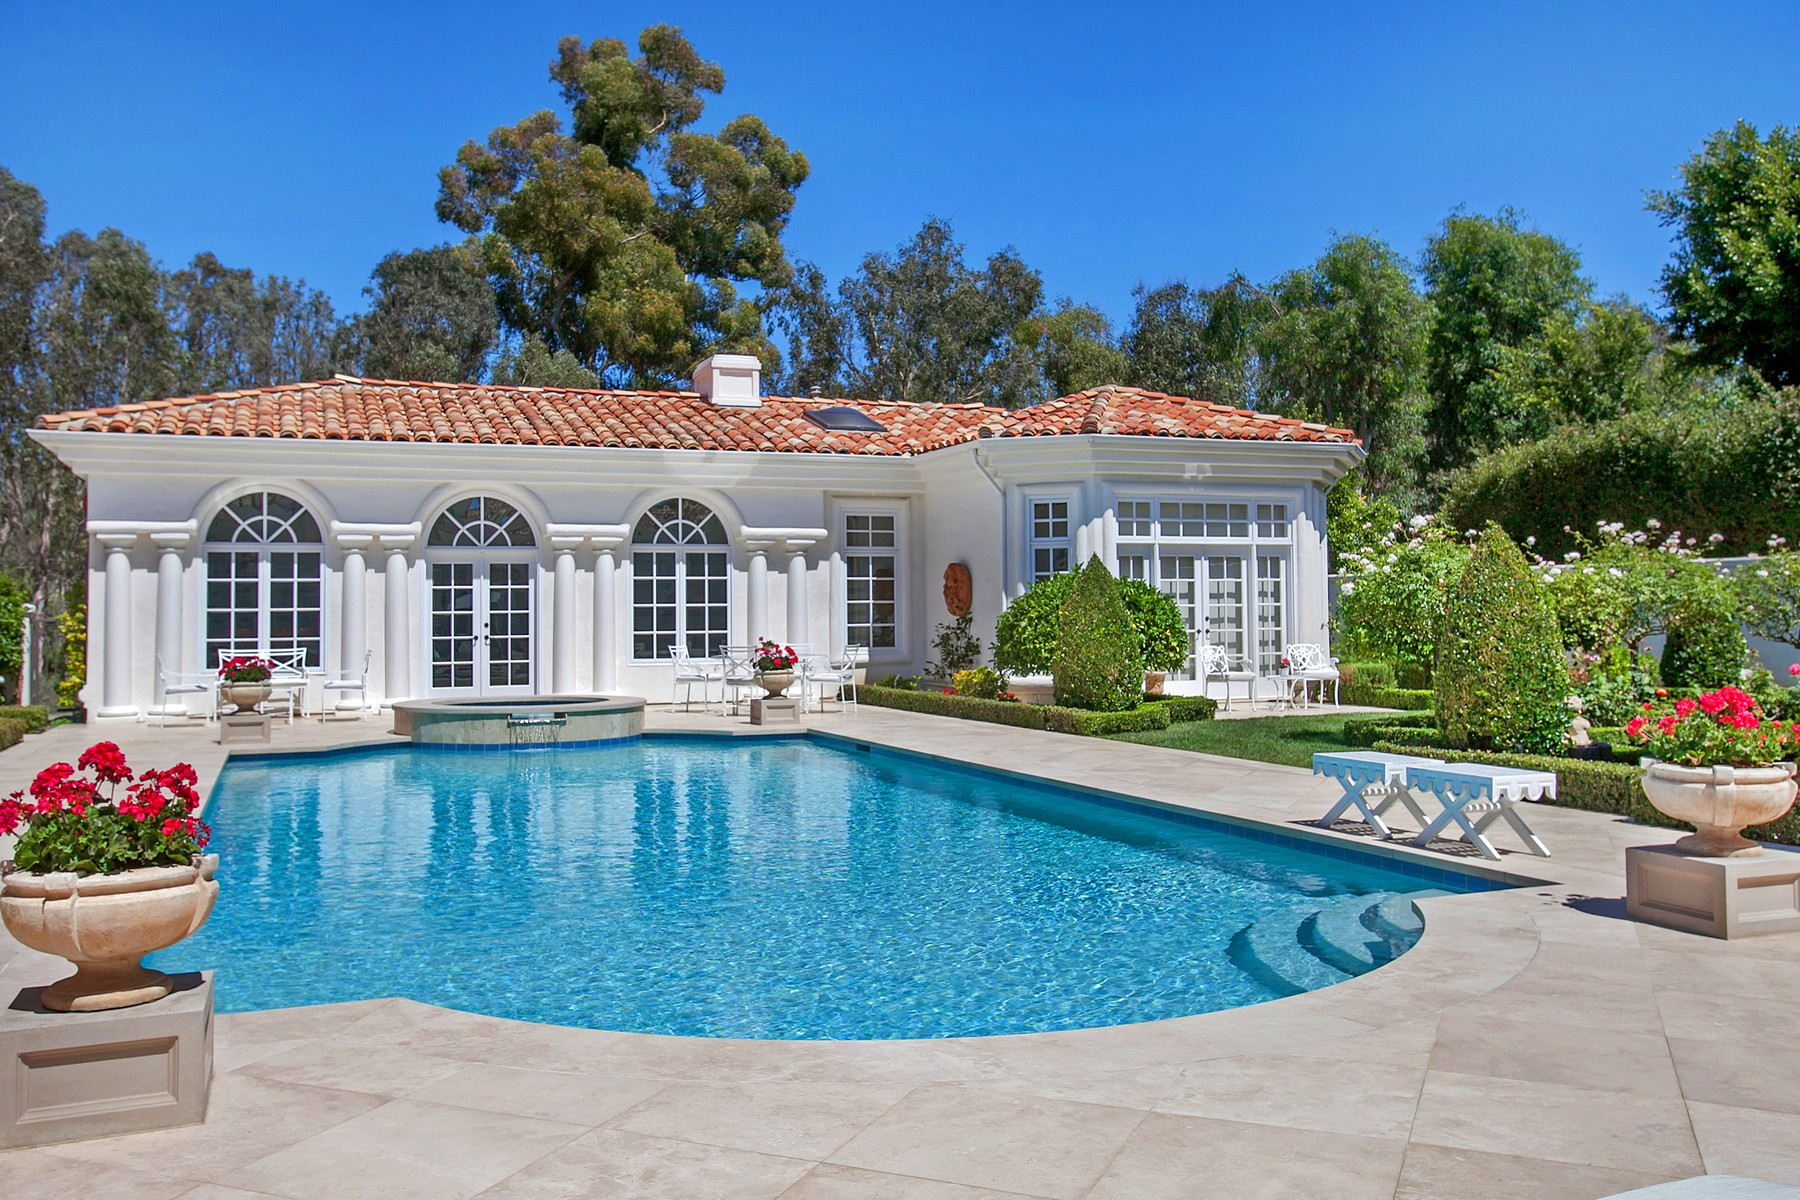 Additional photo for property listing at 16648 Circa Del Sur  Rancho Santa Fe, California 92067 Estados Unidos